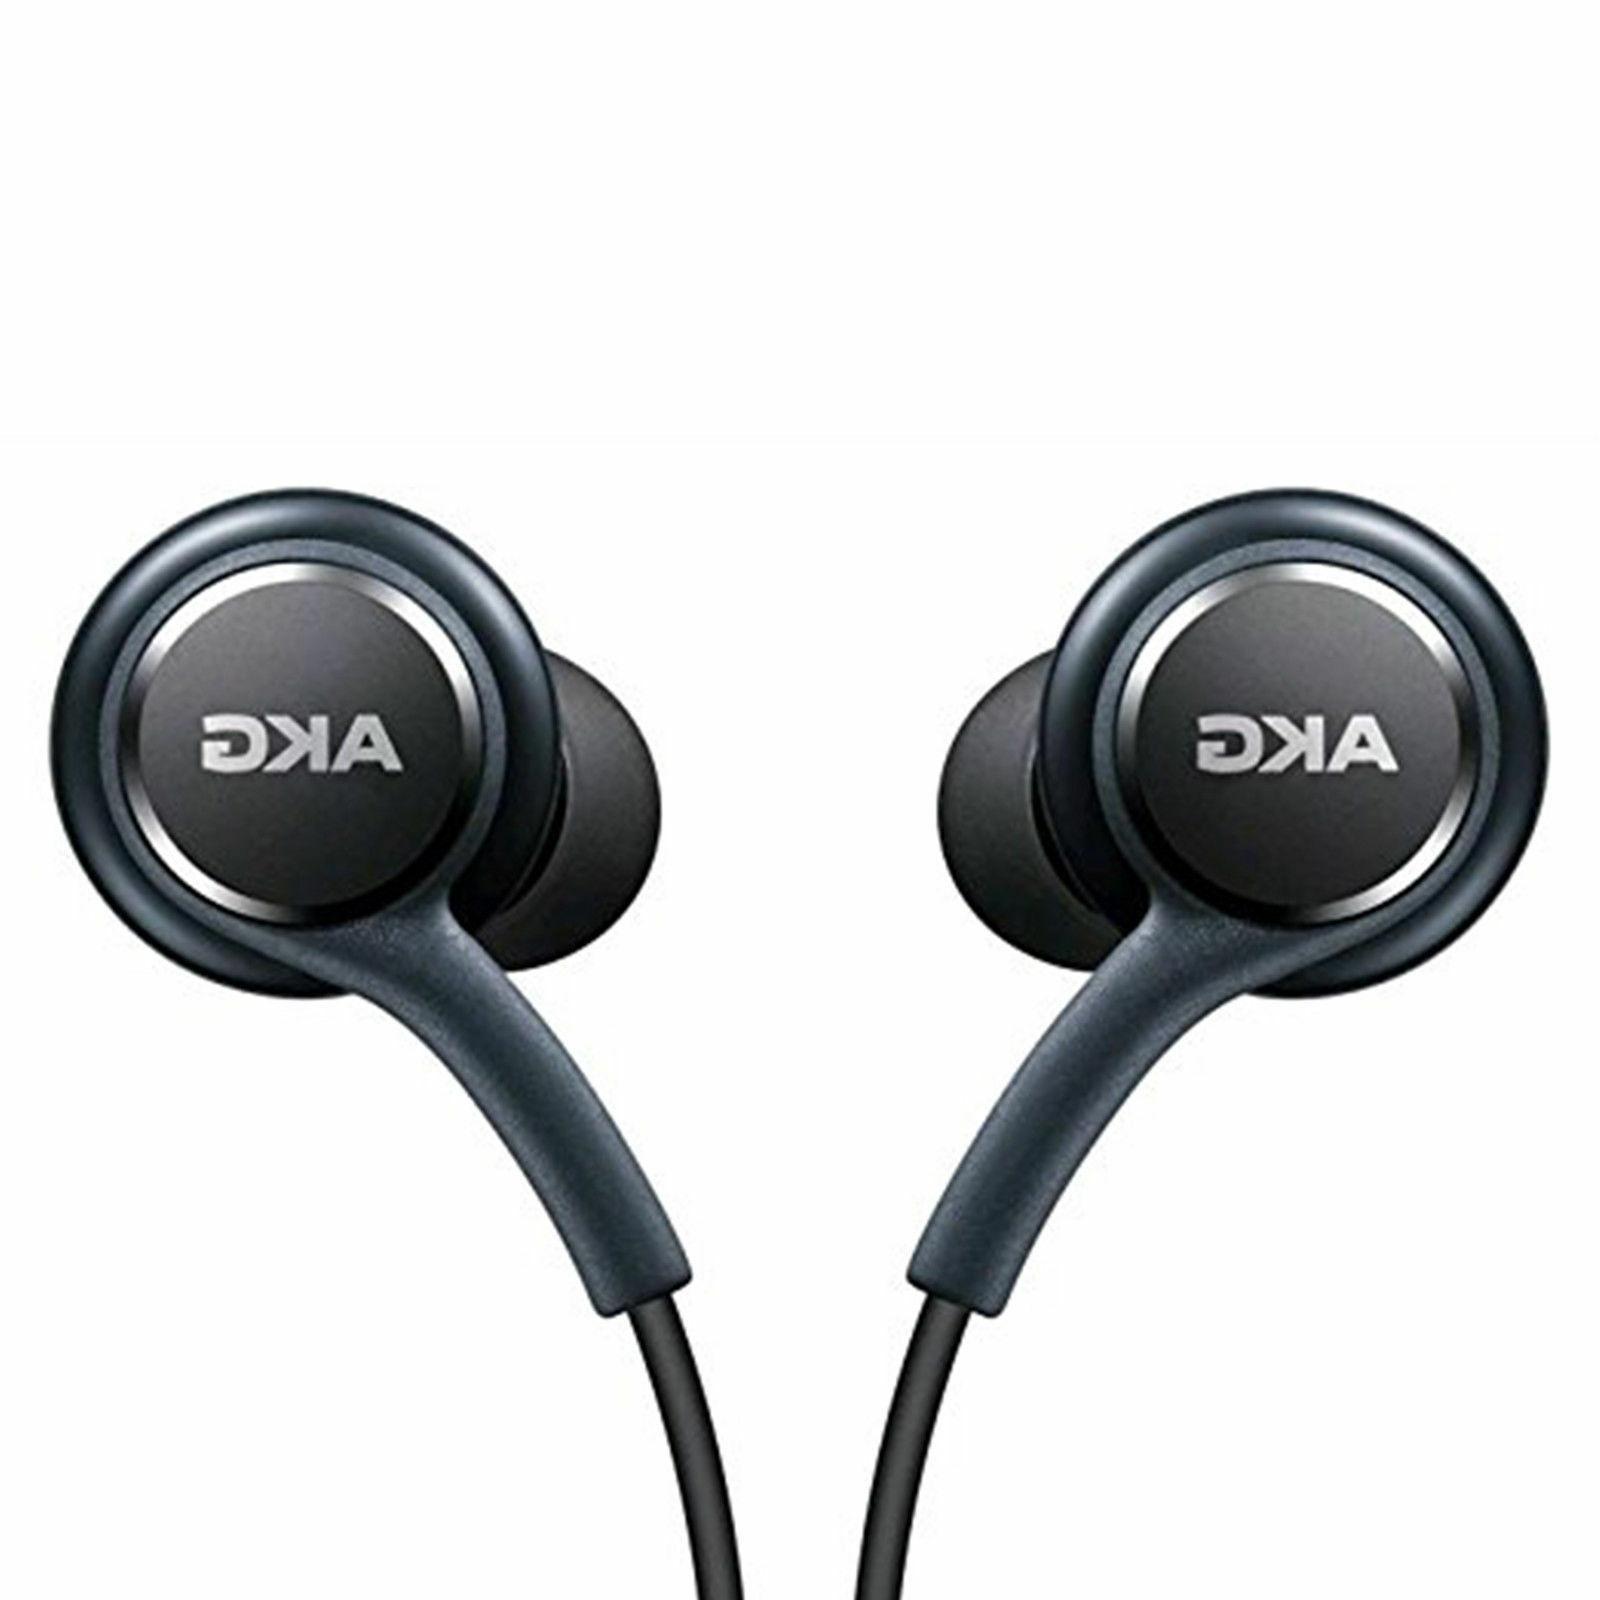 NEW AKG Headphones Ear Buds EO-IG955 For Samsung Galaxy S8 S